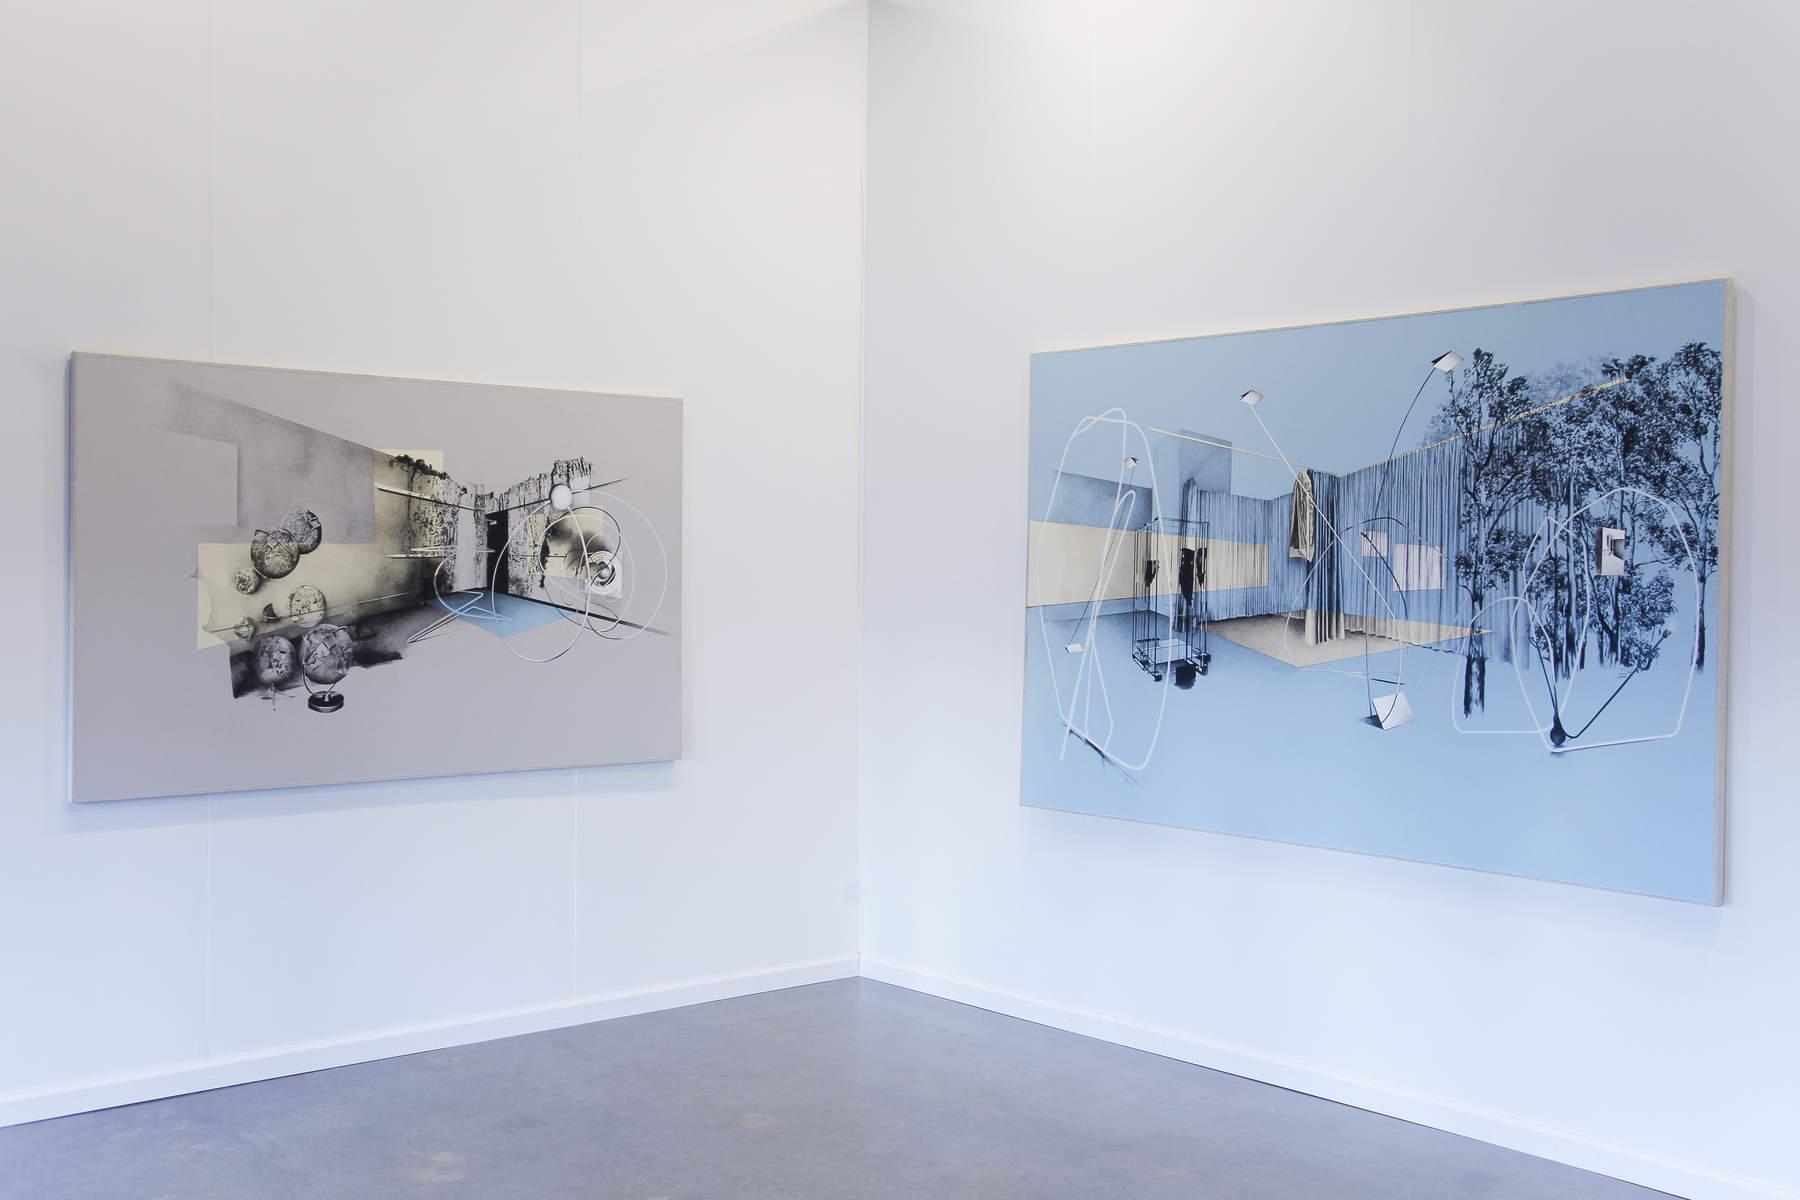 Tatiana Trouve at Galerie Perrotin 01